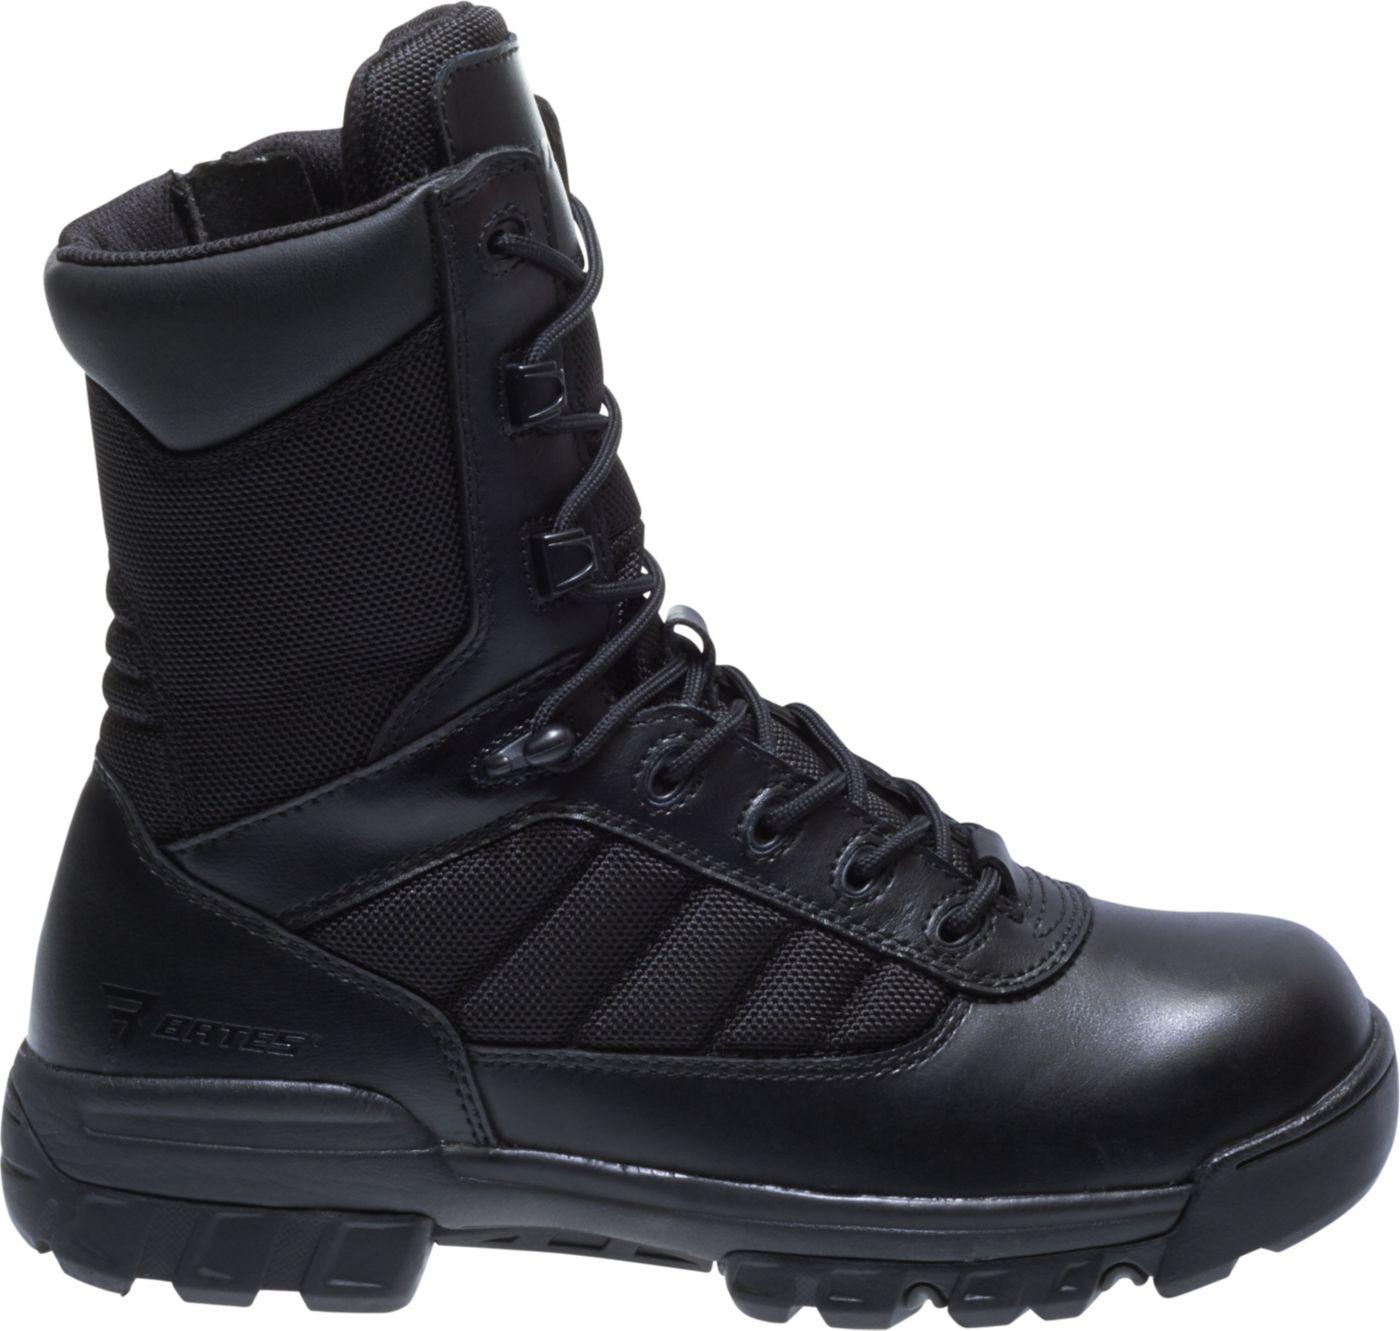 Bates Women's Tactical Sport 8'' Size Zip Work Boots